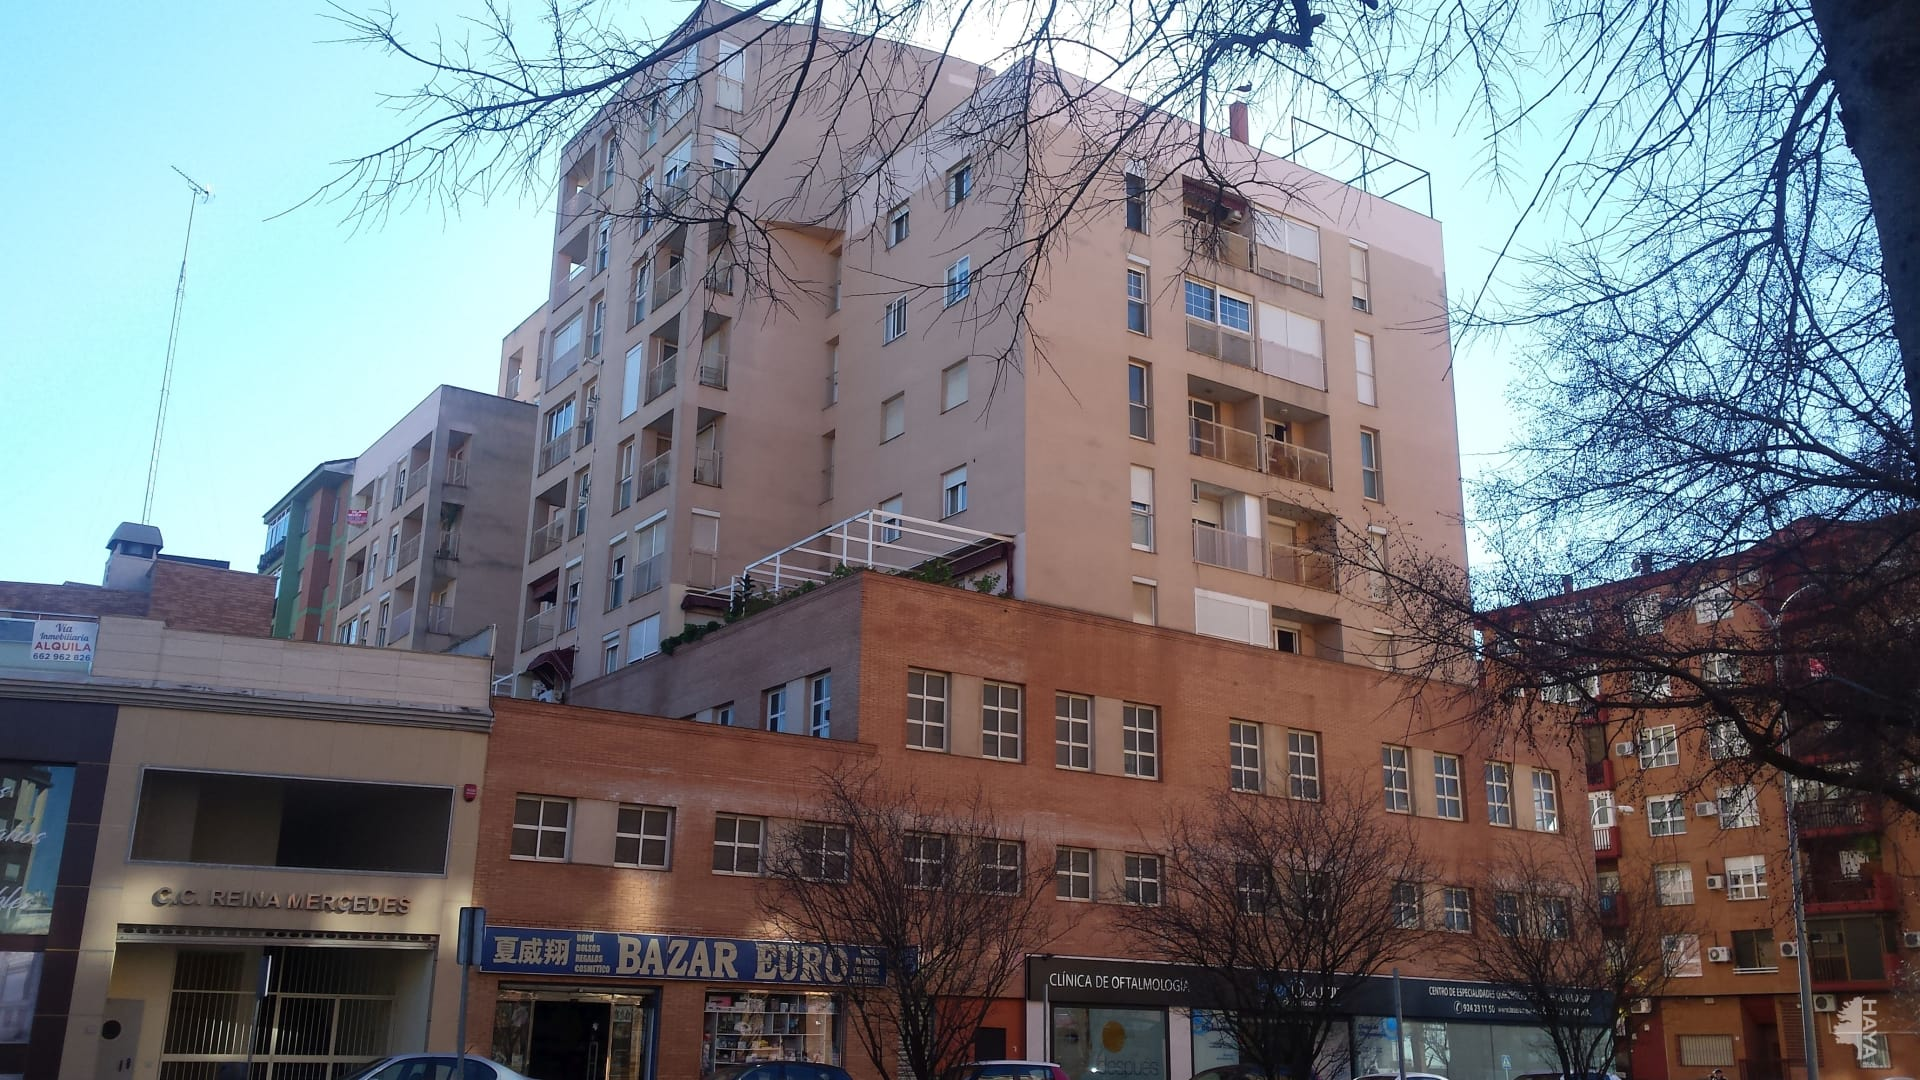 Piso en venta en Badajoz, Badajoz, Calle Alonso Nuñez, 140.800 €, 1 habitación, 1 baño, 111 m2